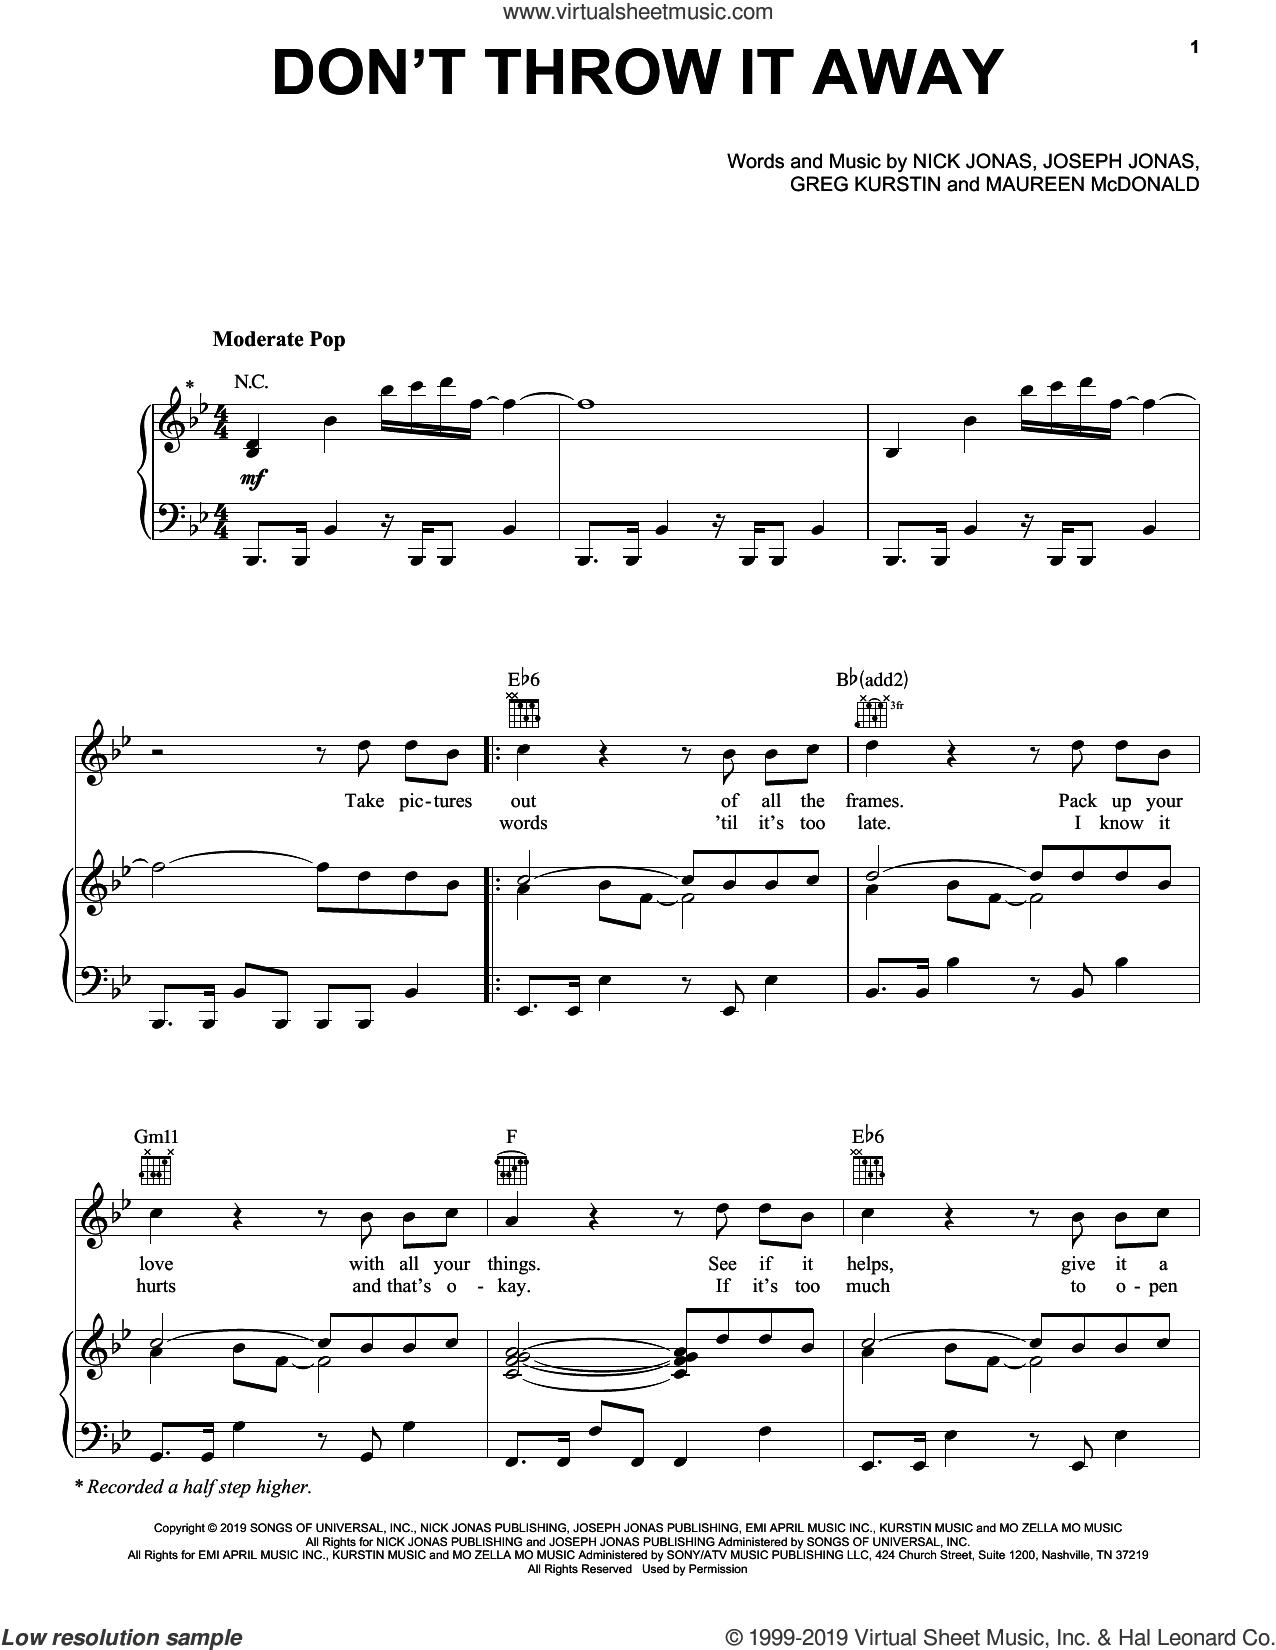 Don't Throw It Away sheet music for voice, piano or guitar by Jonas Brothers, Greg Kurstin, Joseph Jonas, Maureen McDonald and Nick Jonas, intermediate skill level